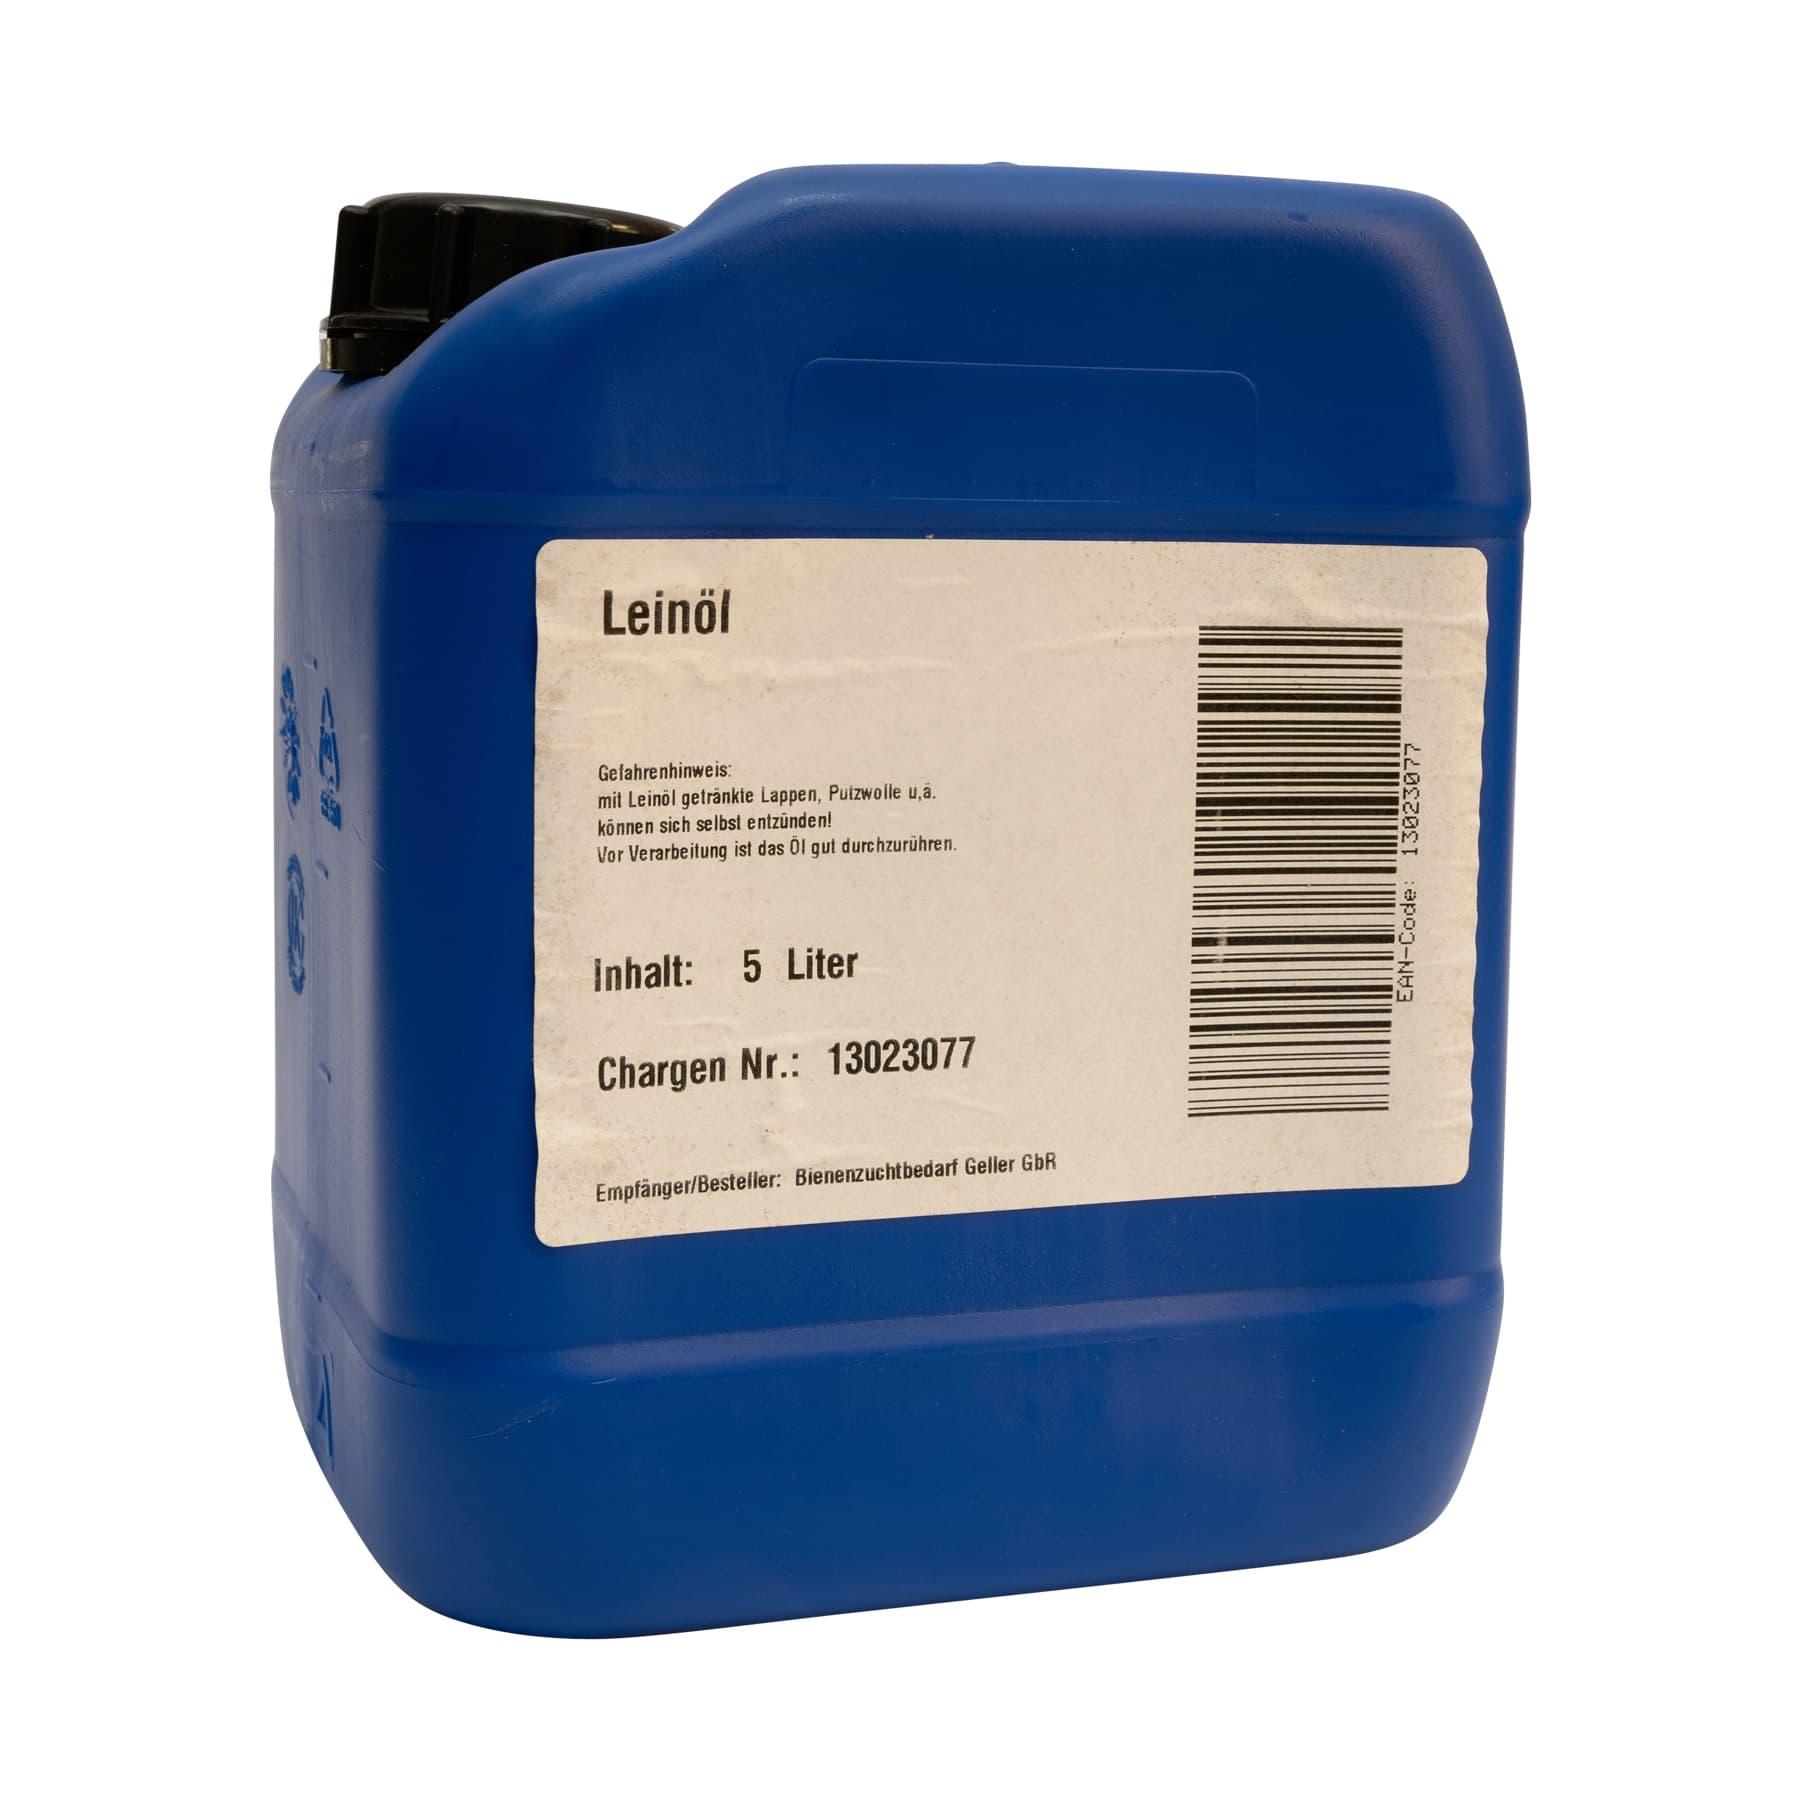 Leinöl, Kanister 5 Liter